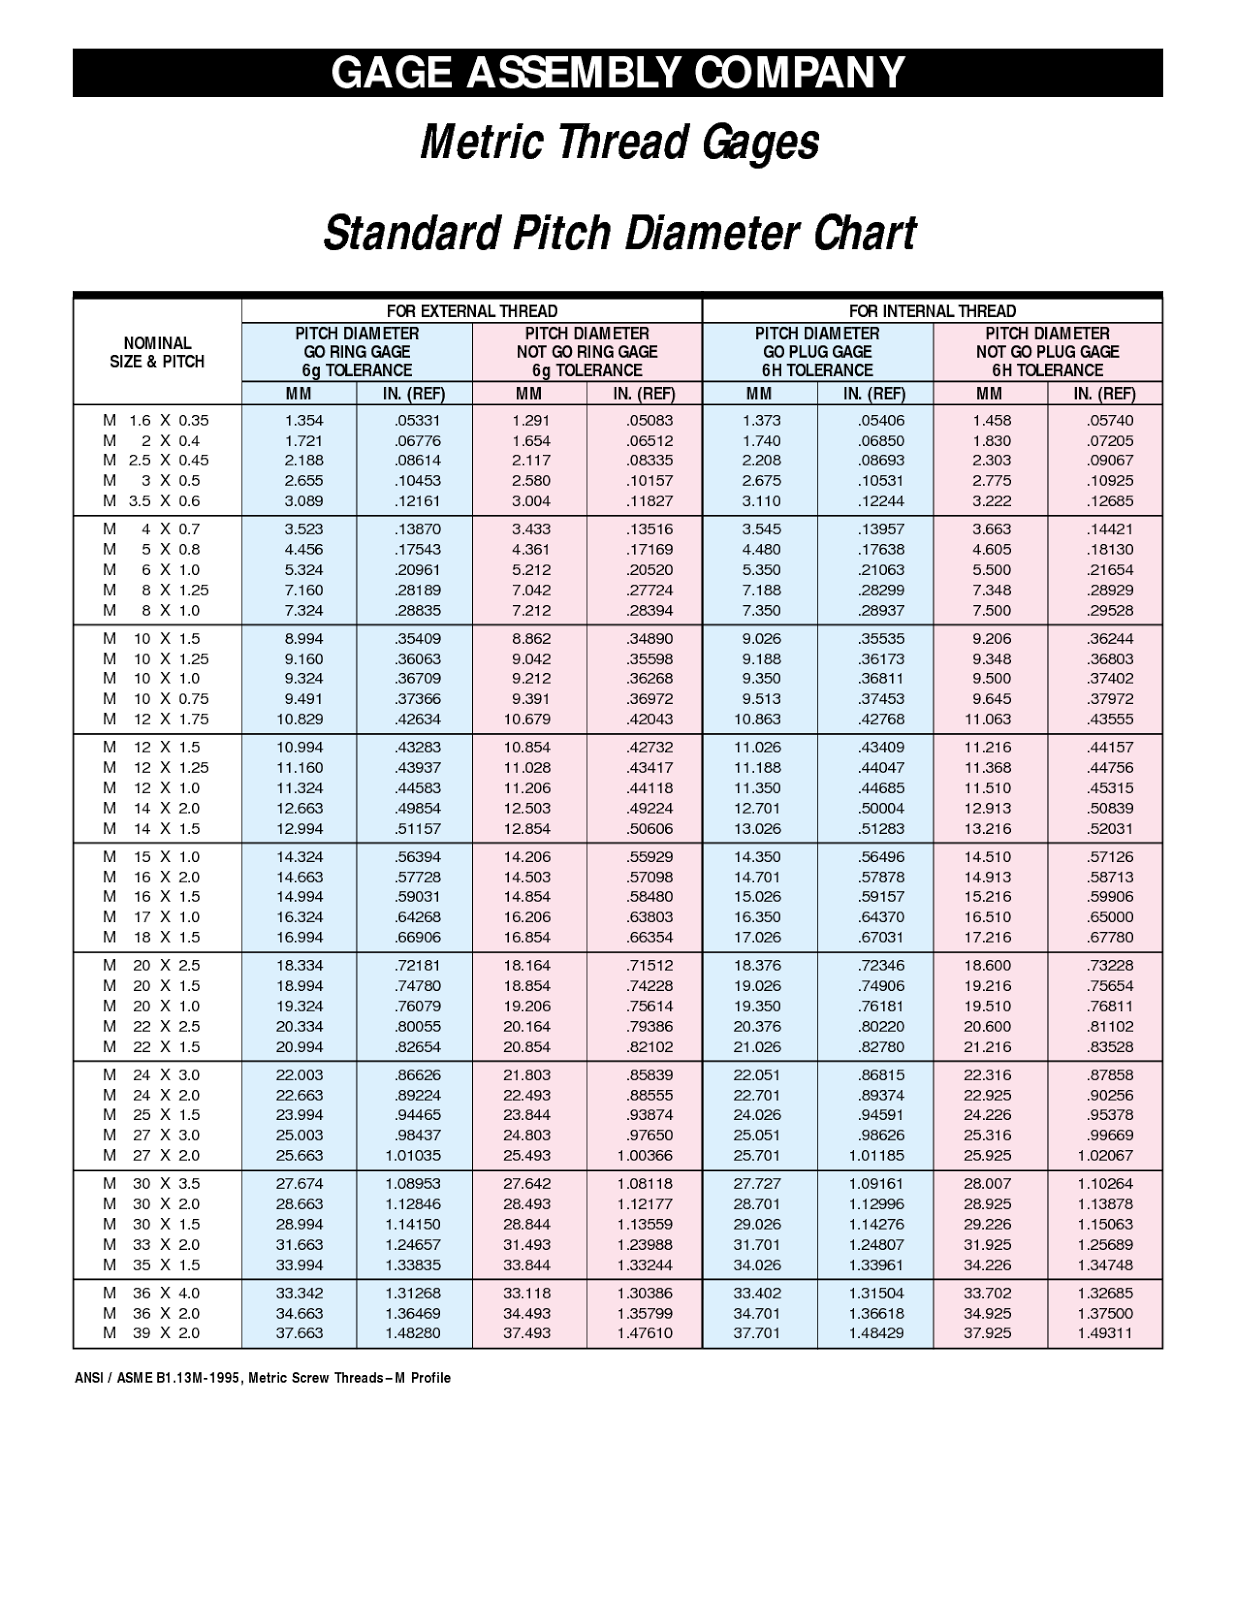 Metric thread pitch chart timiz conceptzmusic co